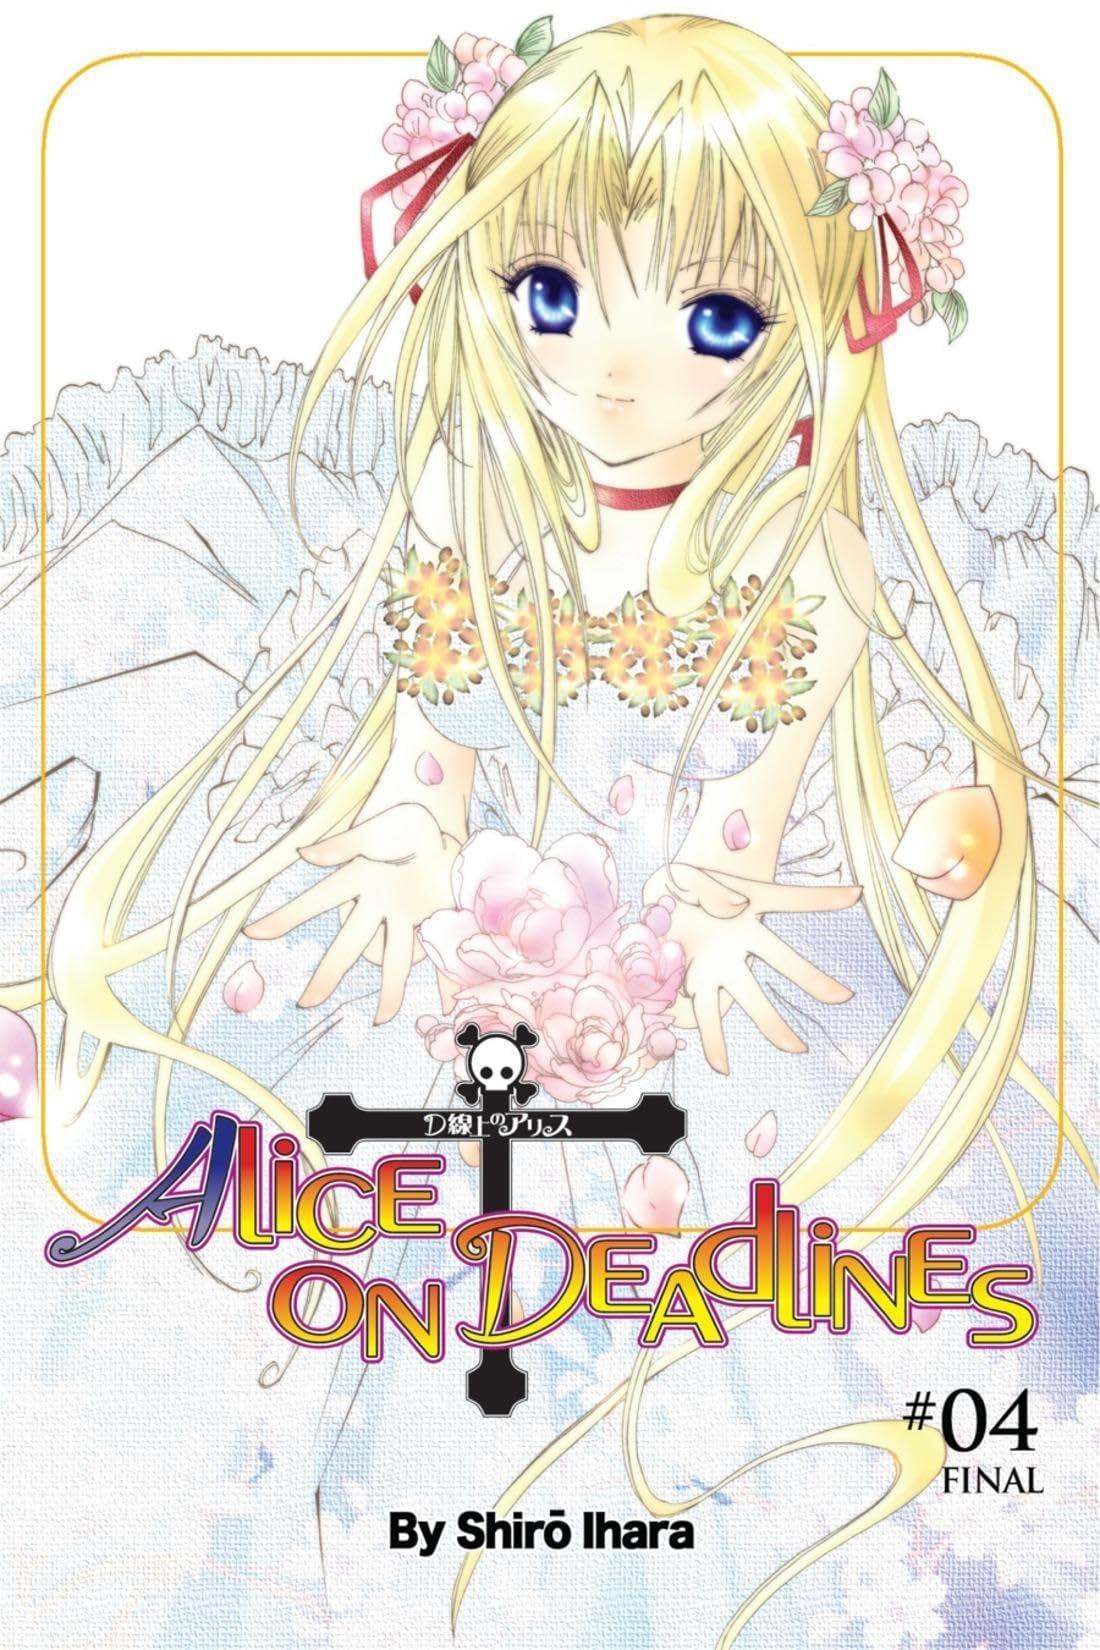 Alice on Deadlines Vol. 4